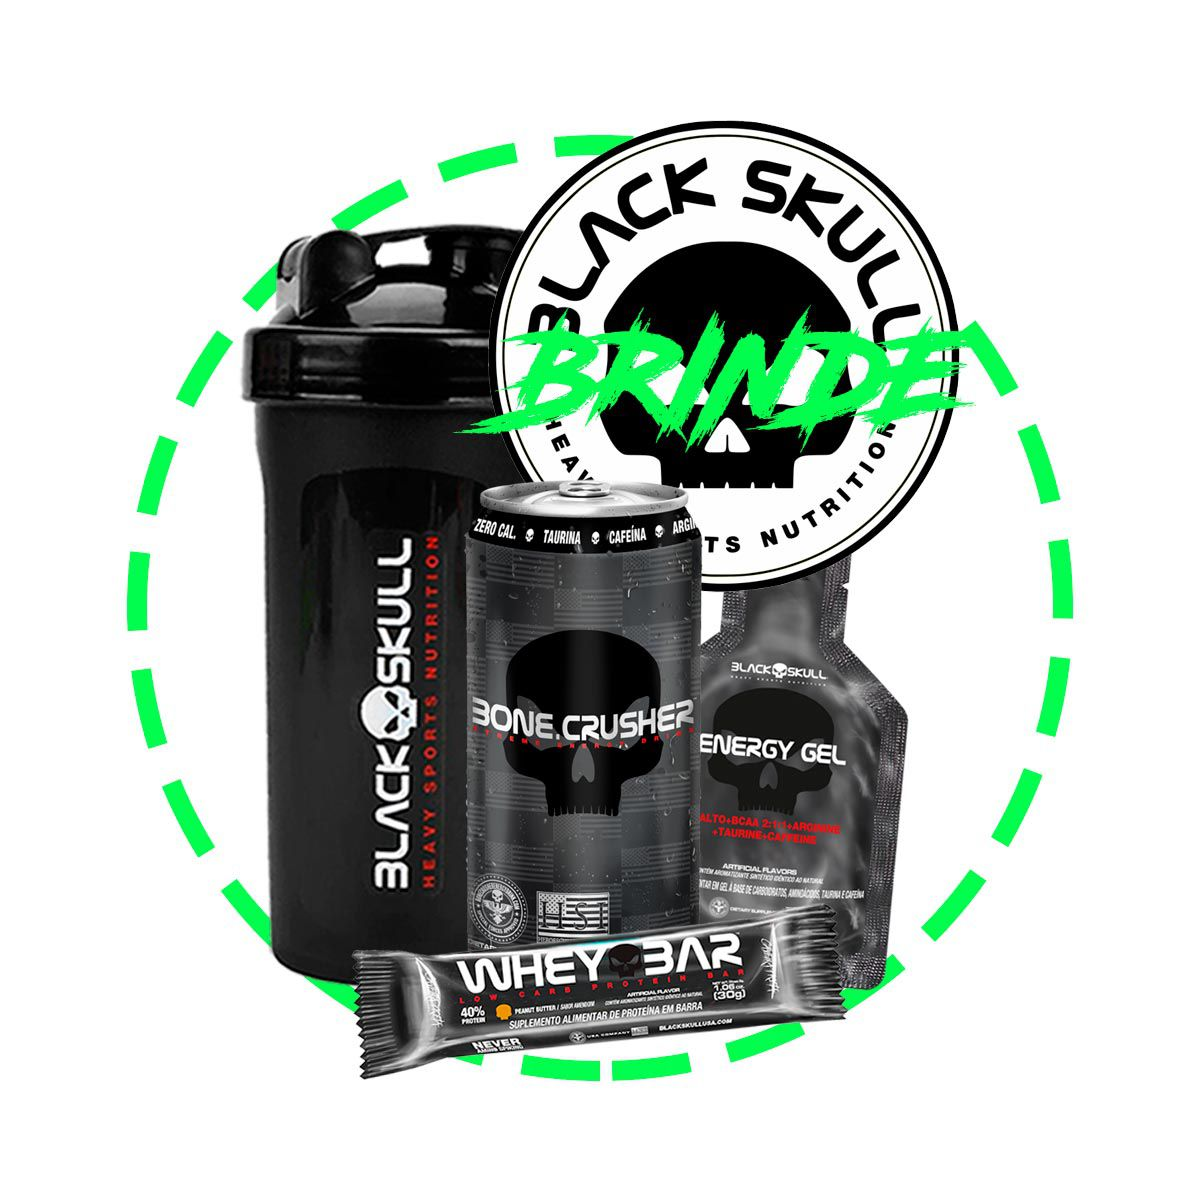 Kit Whey 3HD Pote 1,8kg + Brindes - Black Skull